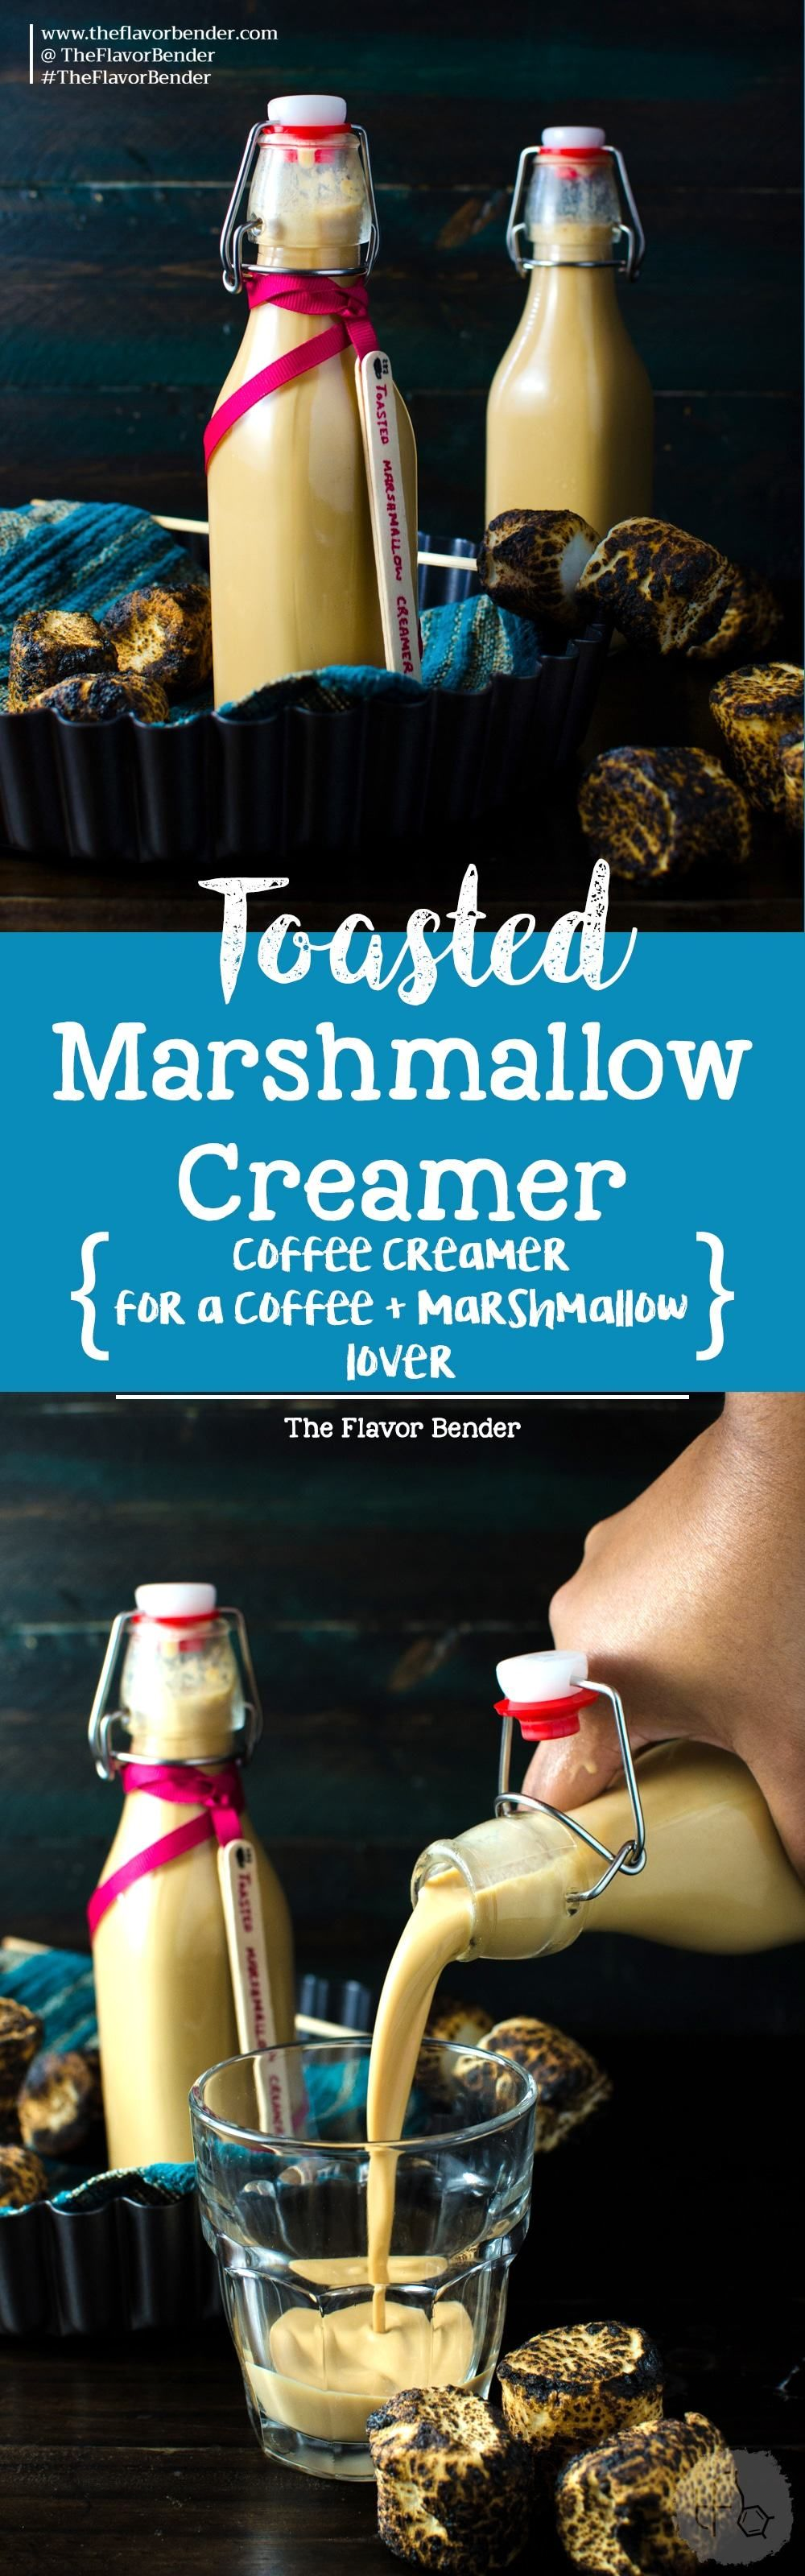 Homemade Toasted Marshmallow Creamer A delicious